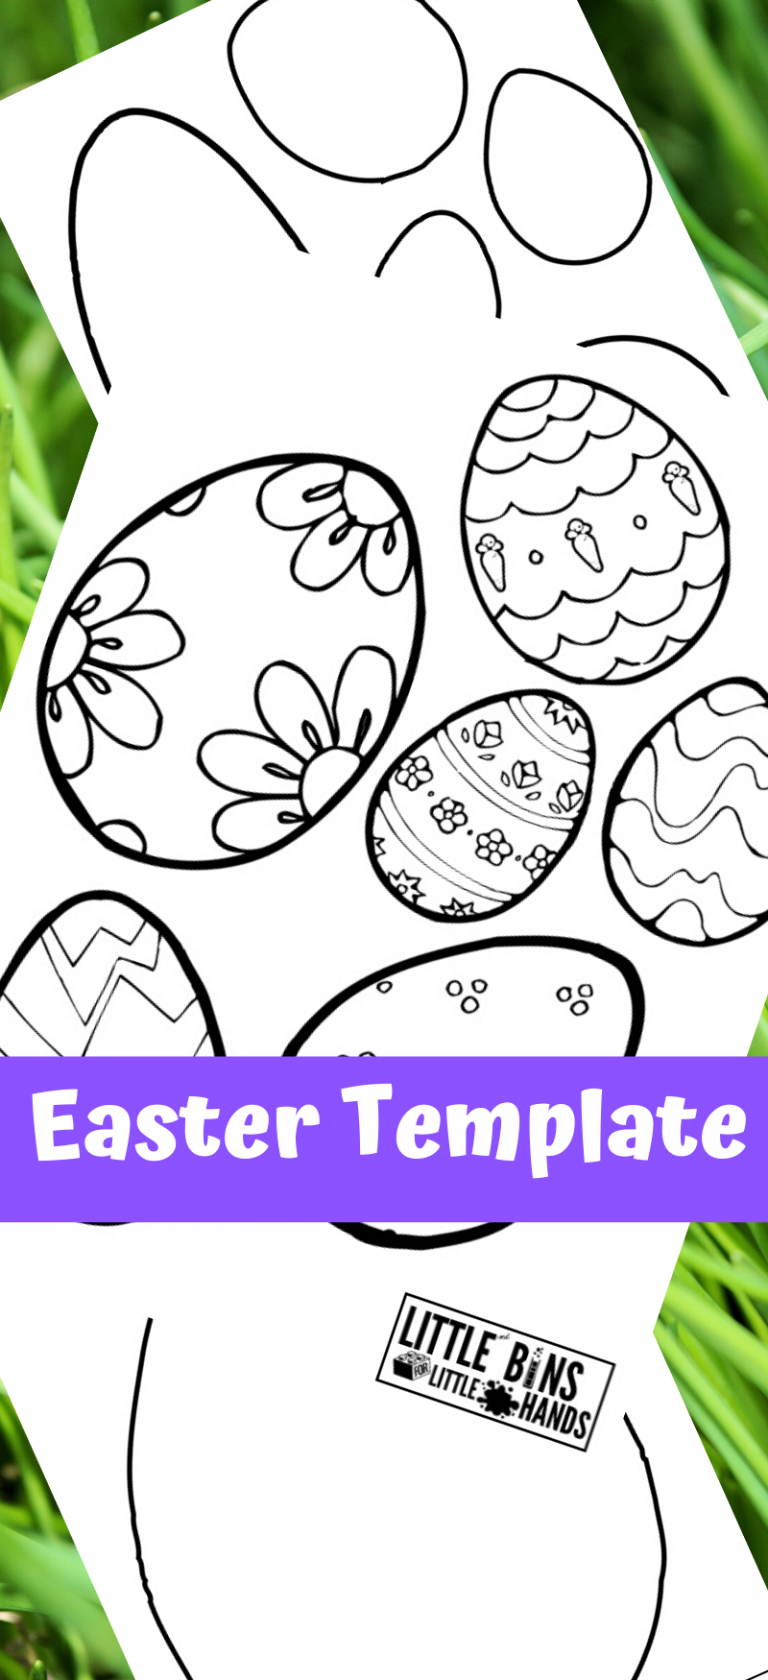 Easter Egg Template Free Printable Pack Easter Egg Template Egg Template Easter Templates